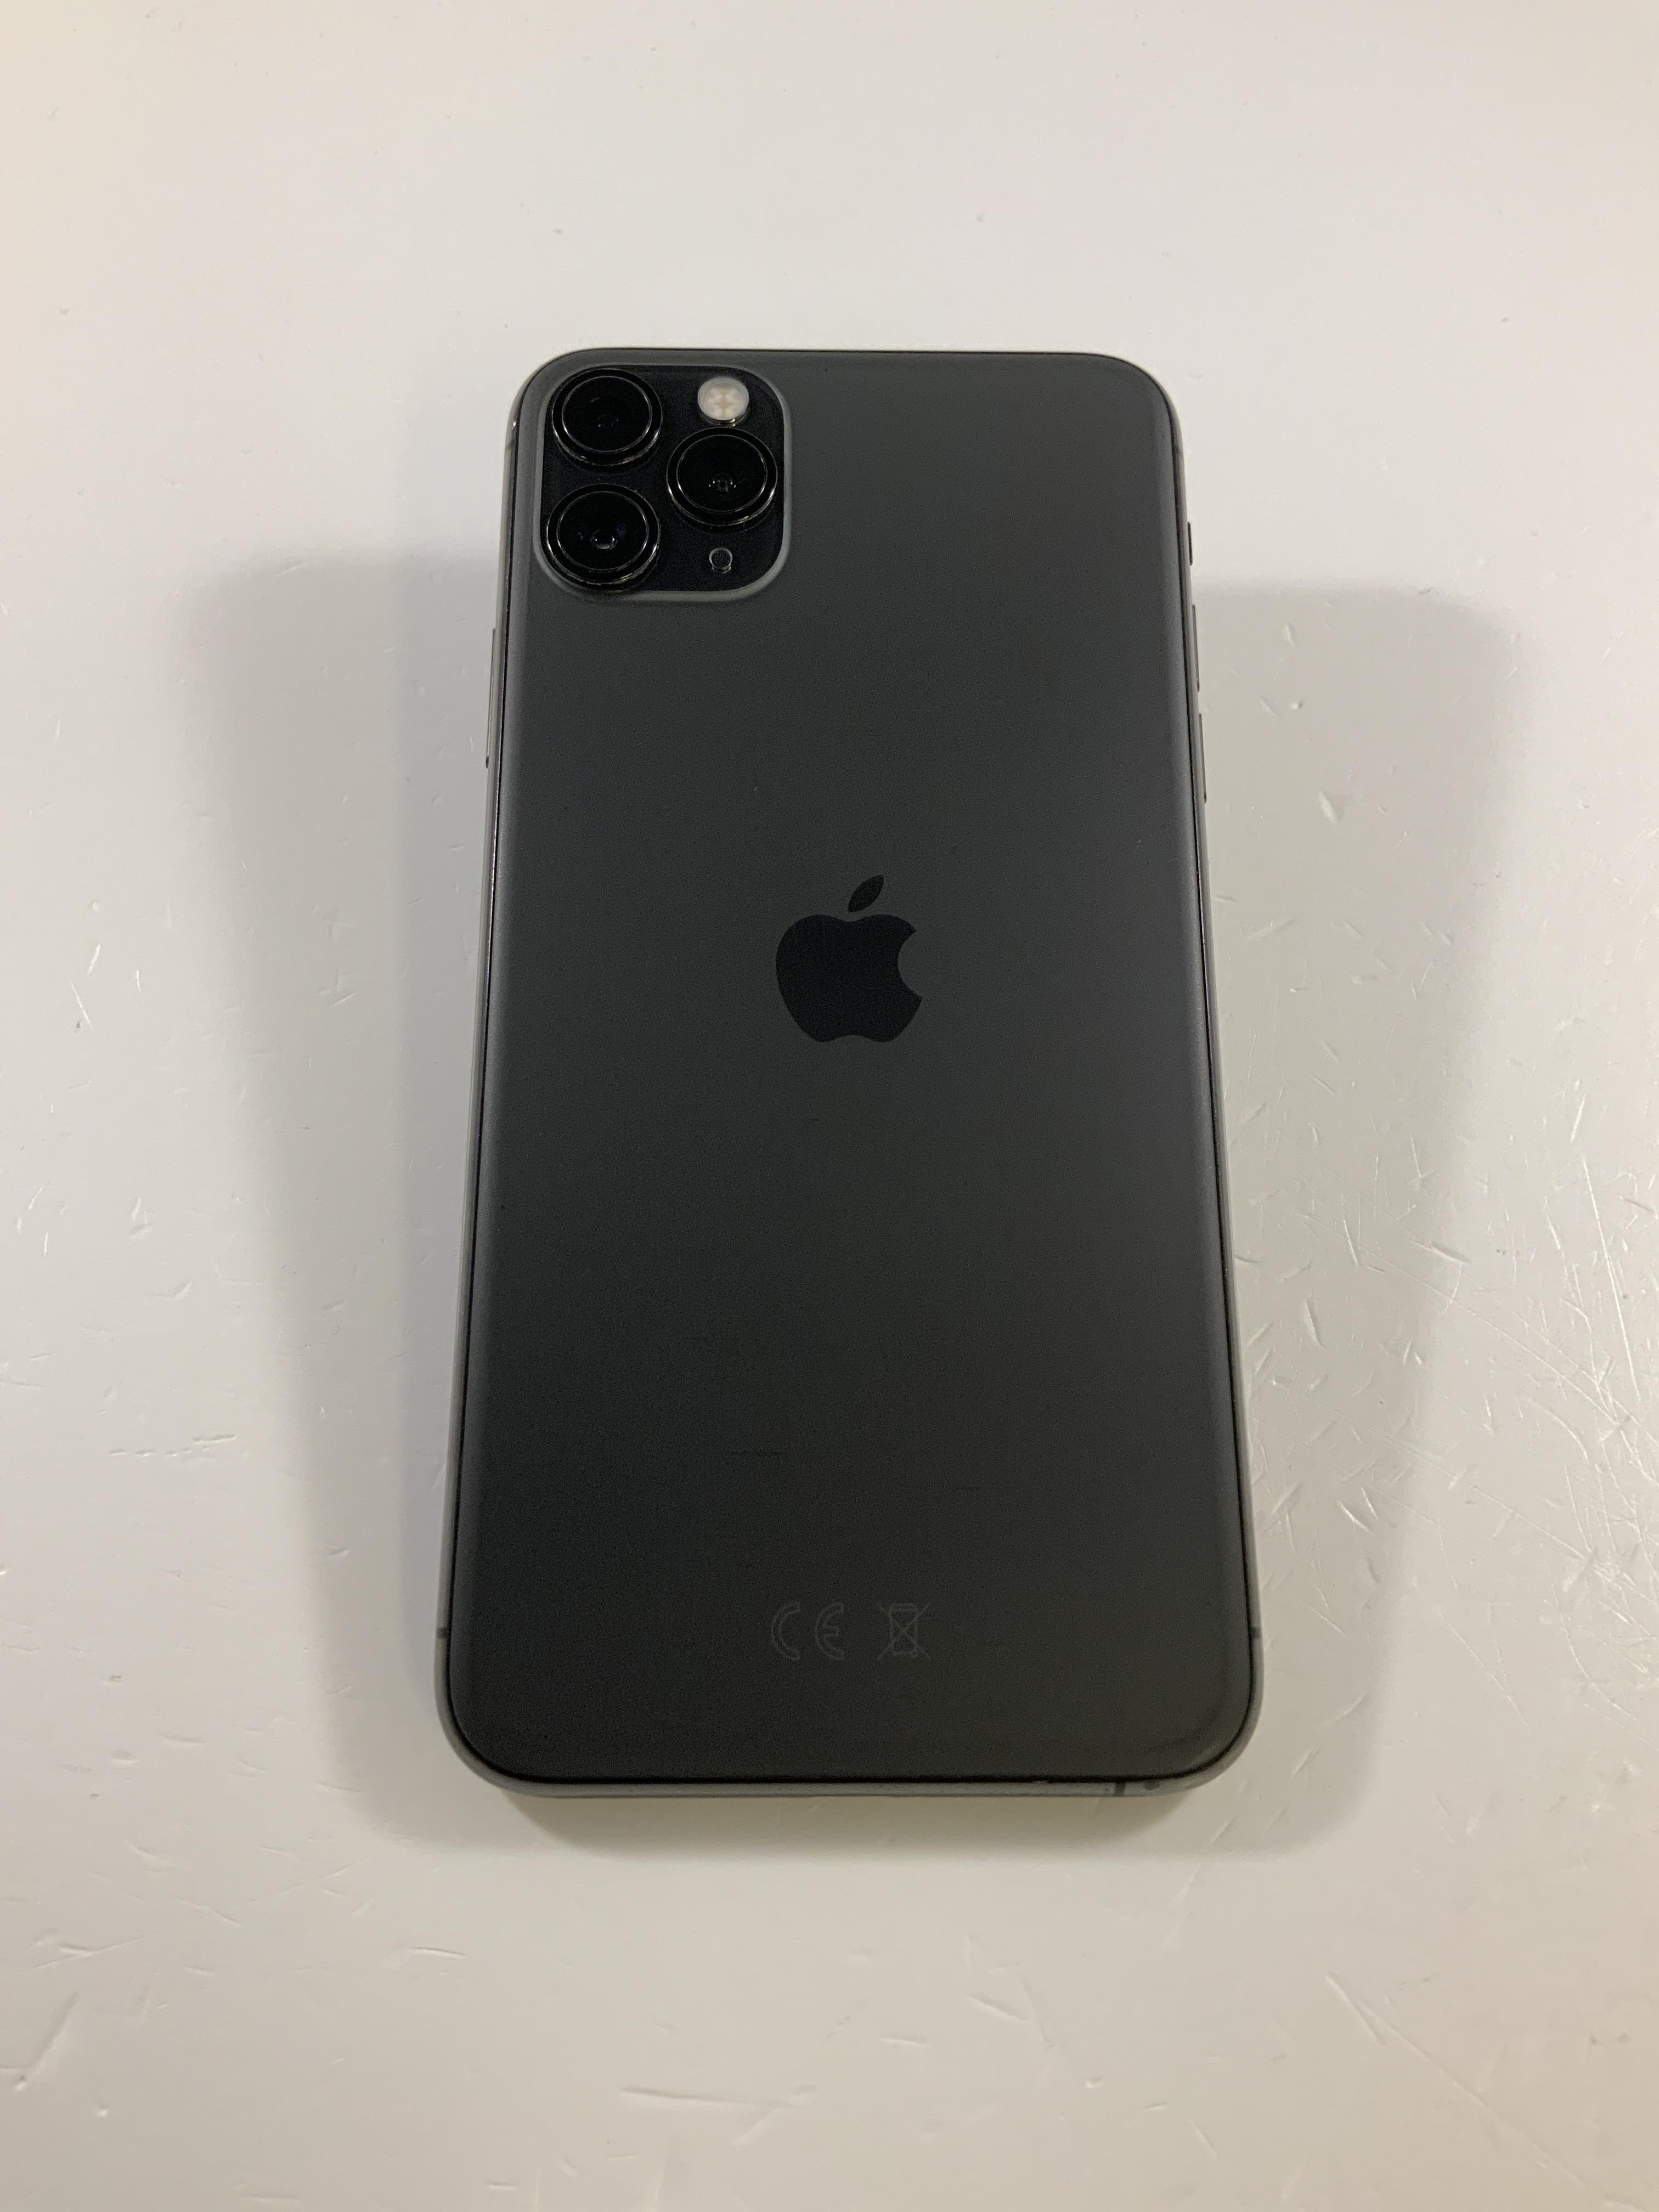 iPhone 11 Pro Max 256GB, 256GB, Space Gray, immagine 3